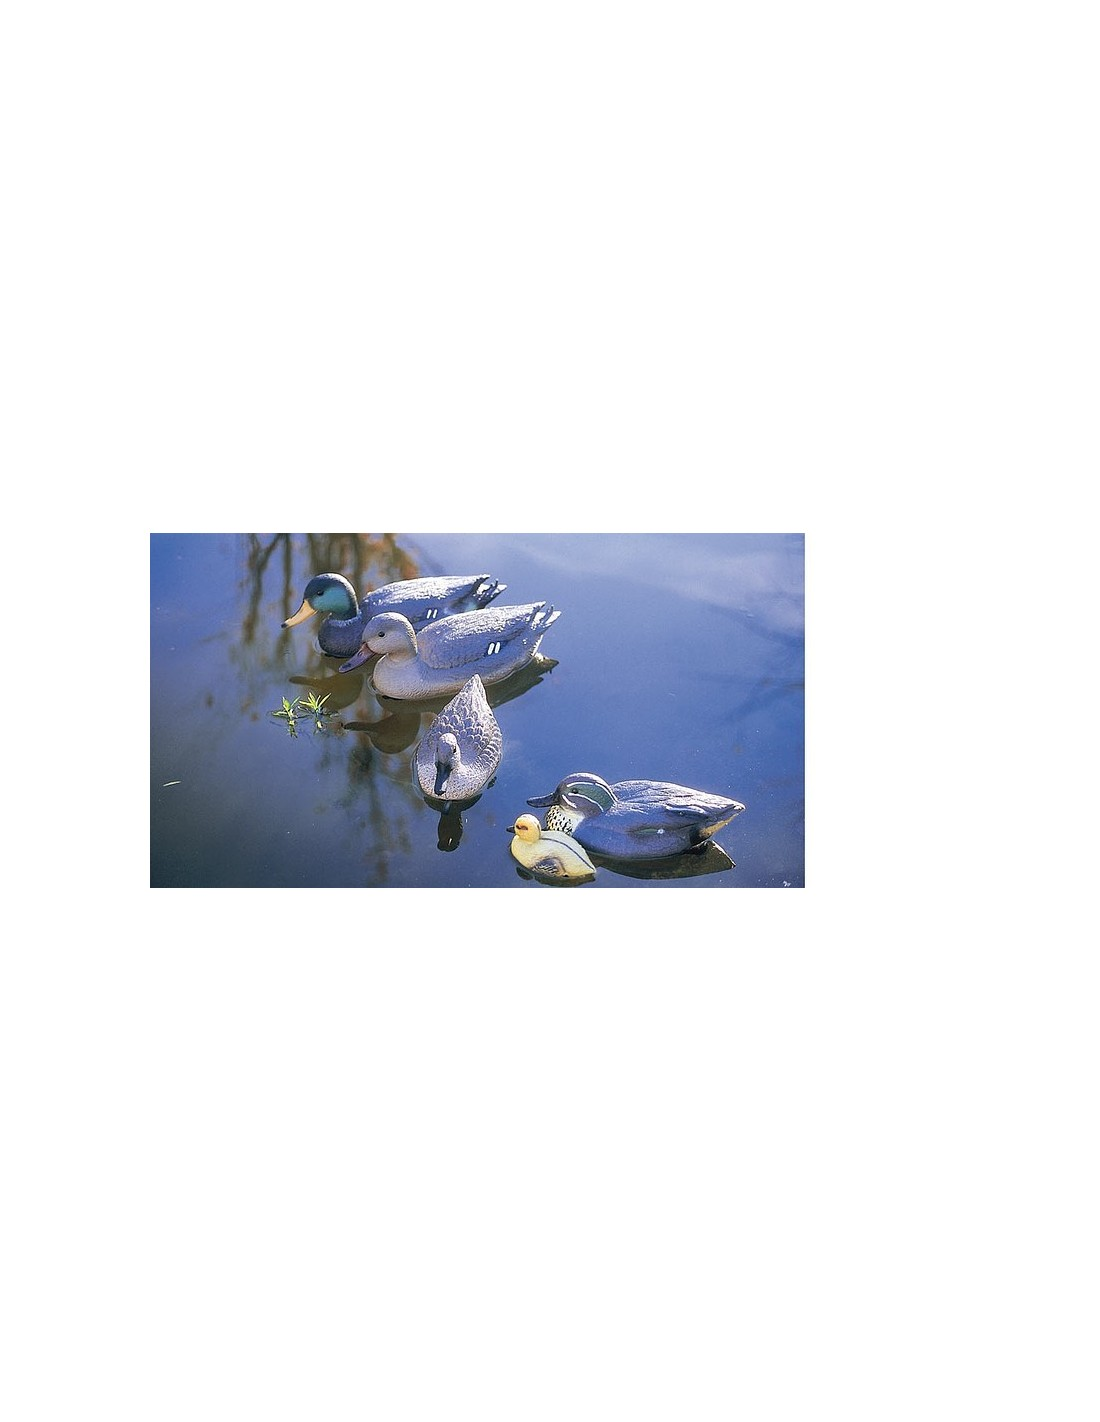 Patito figura decorativa for Accesorios para estanques